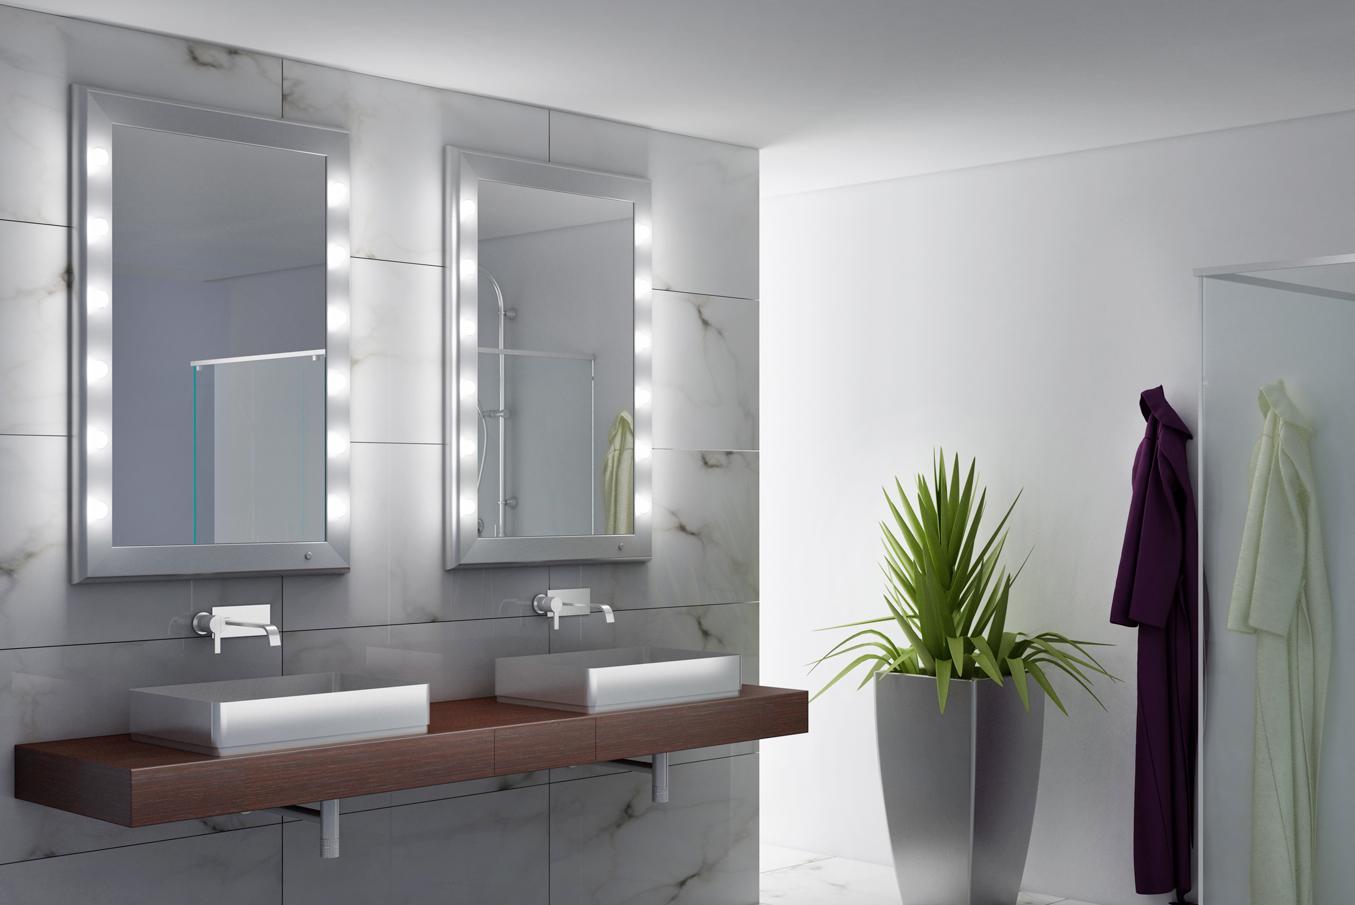 vertical rectangular frameless illuminated framed wall mirror for double sink bathroom, minimal modern marble wooden interior design